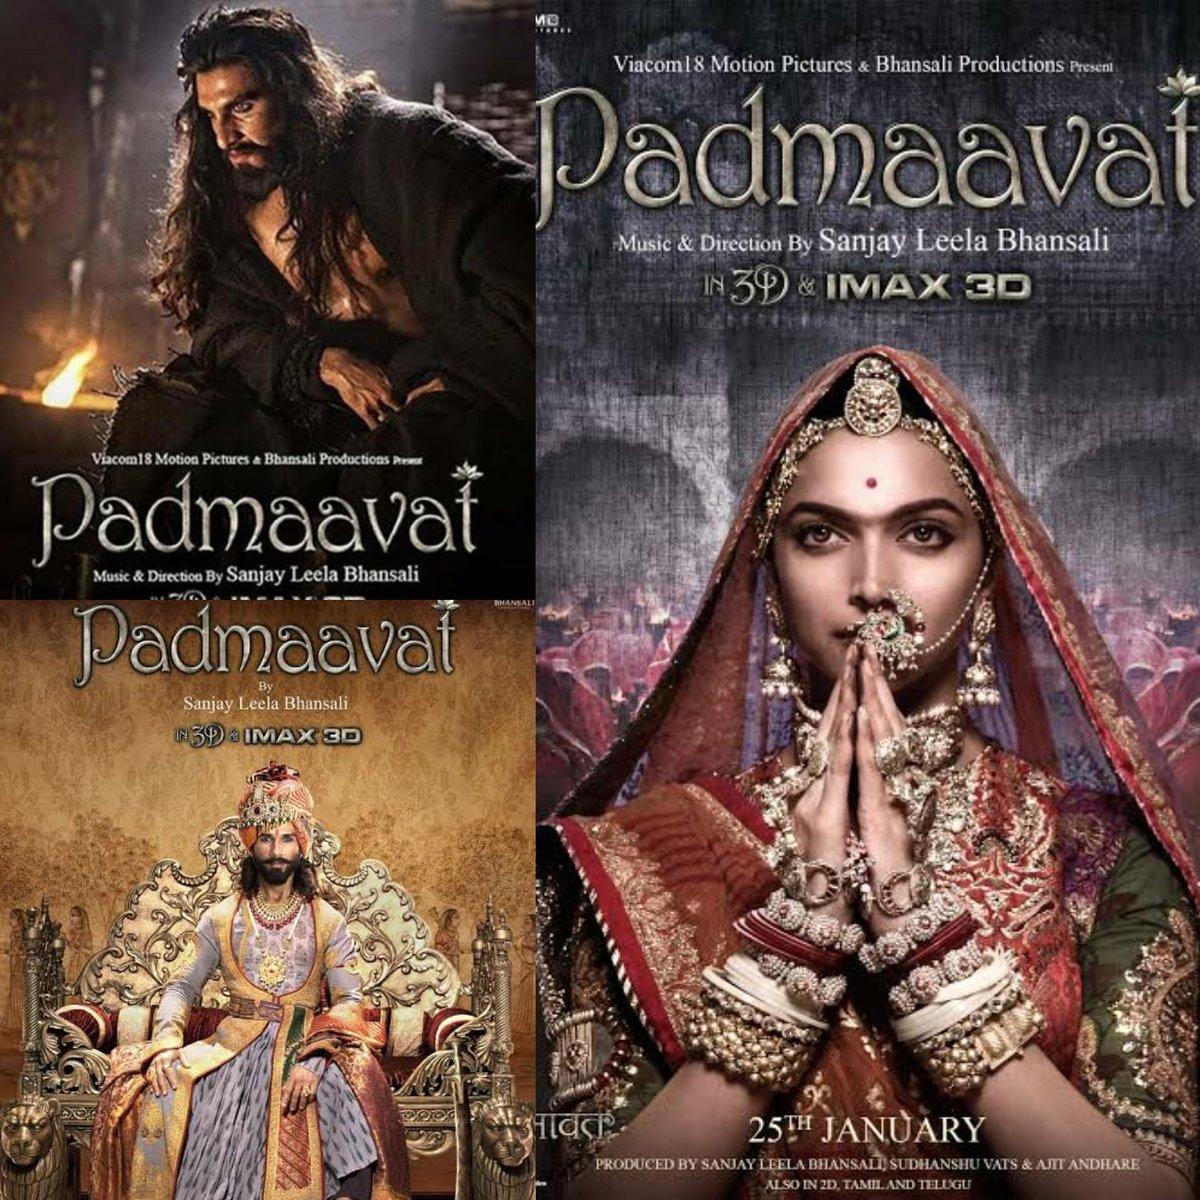 Celebrating 3 years of this saga! Which if these is your favorite character?  #3yearsofPadmaavat #DeepikaPadukone #RanveerSingh #ShahidKapoor #Cinepolis #CinepolisIndia